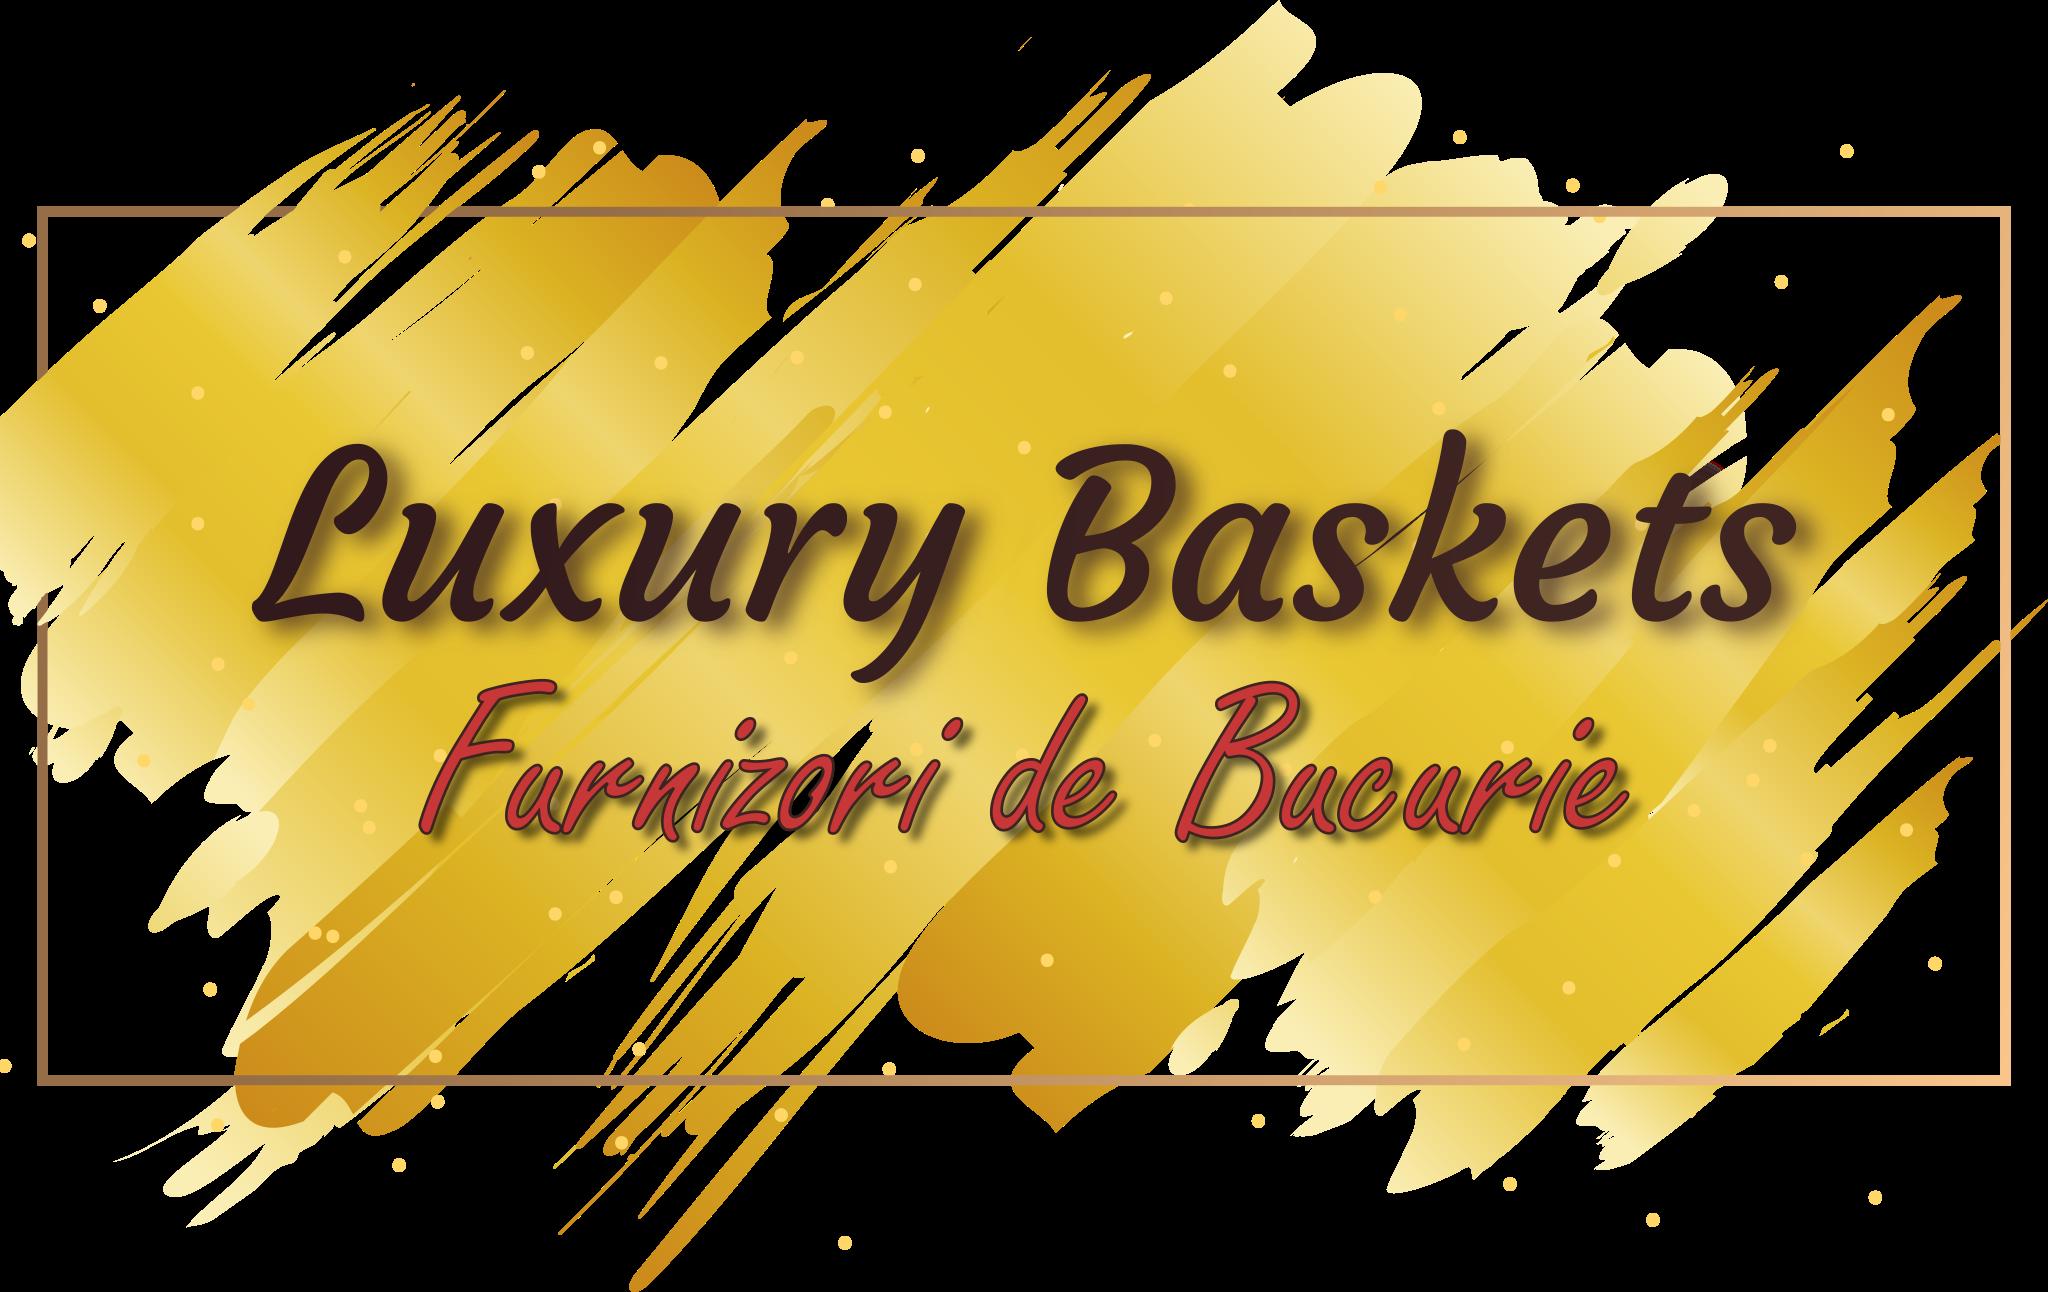 Luxury Baskets